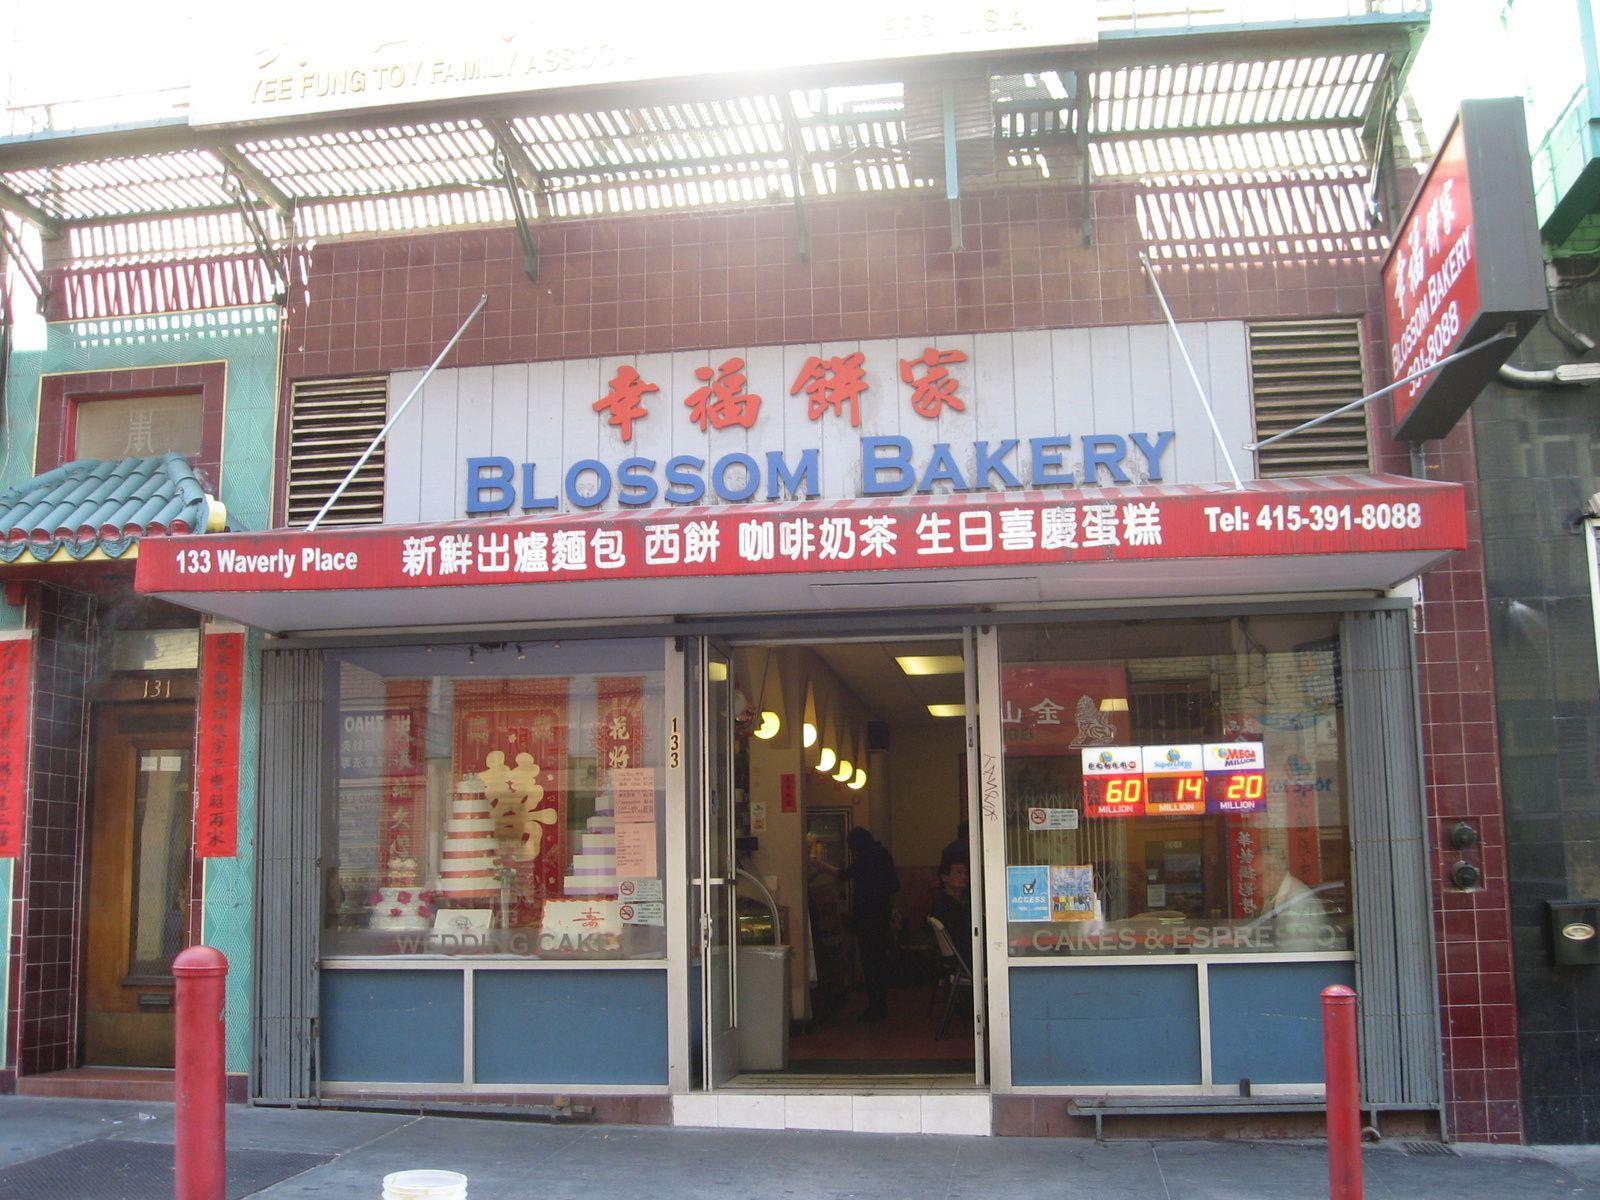 fruits du dragon, architecture chinoise et  Bakery